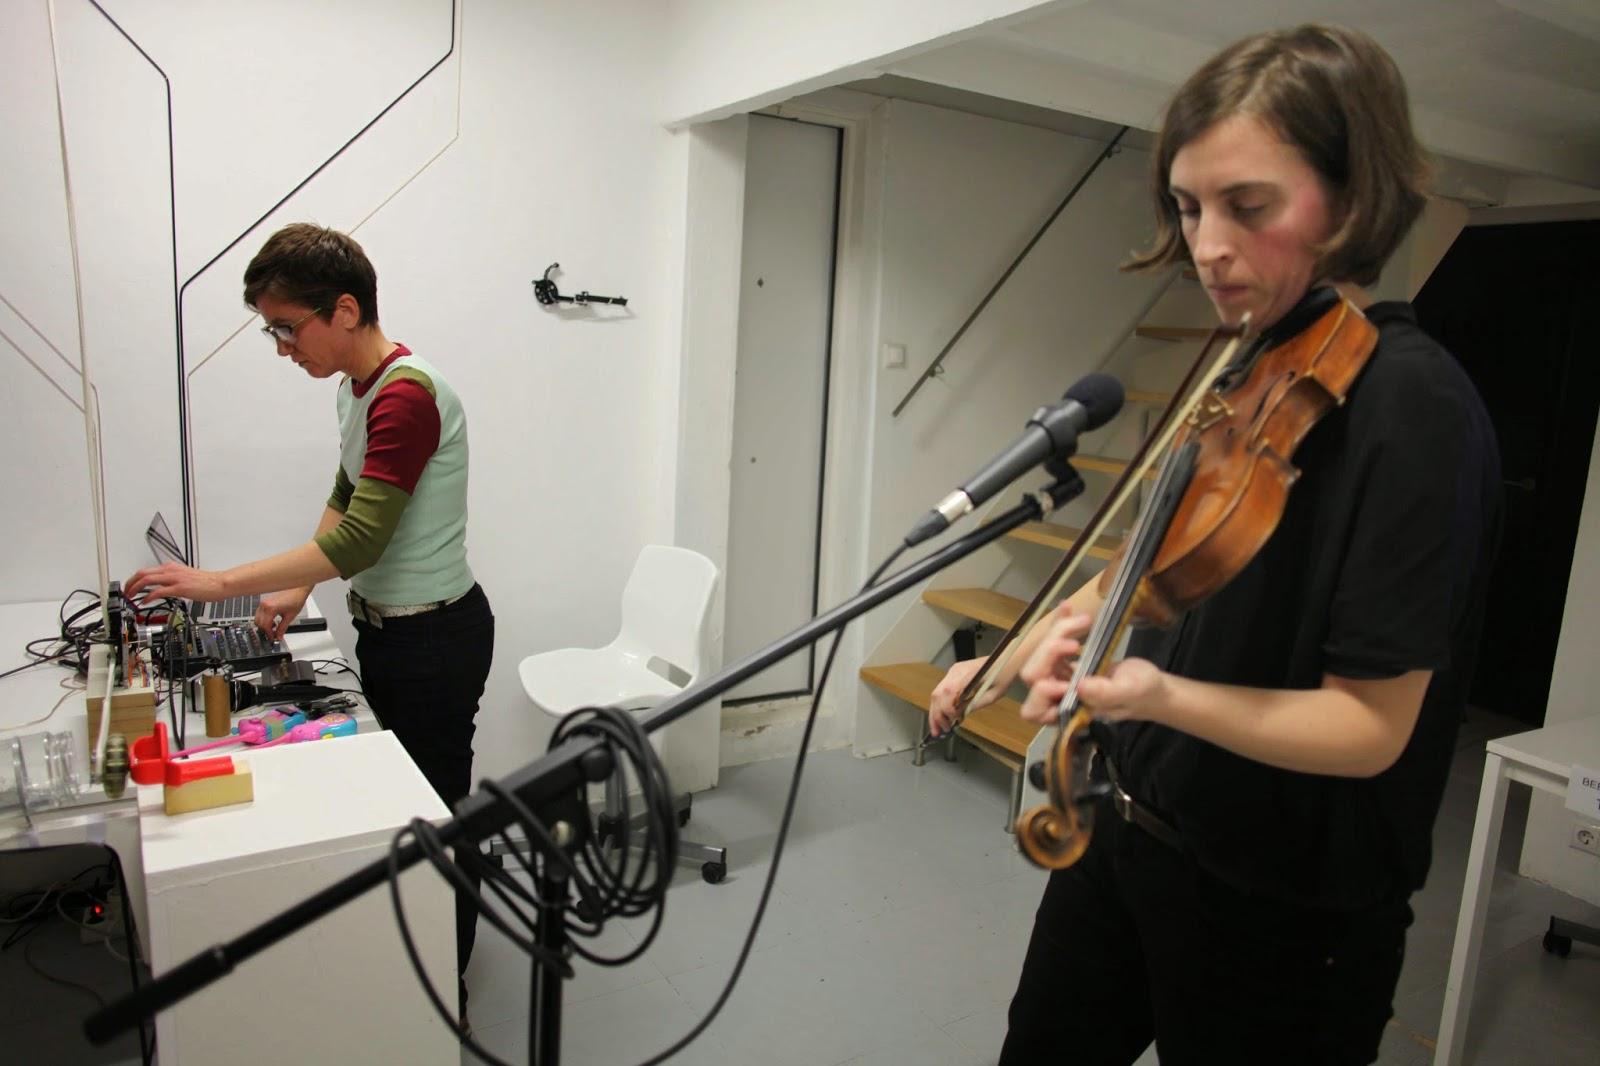 Thessia Machado: REC/PLAY.